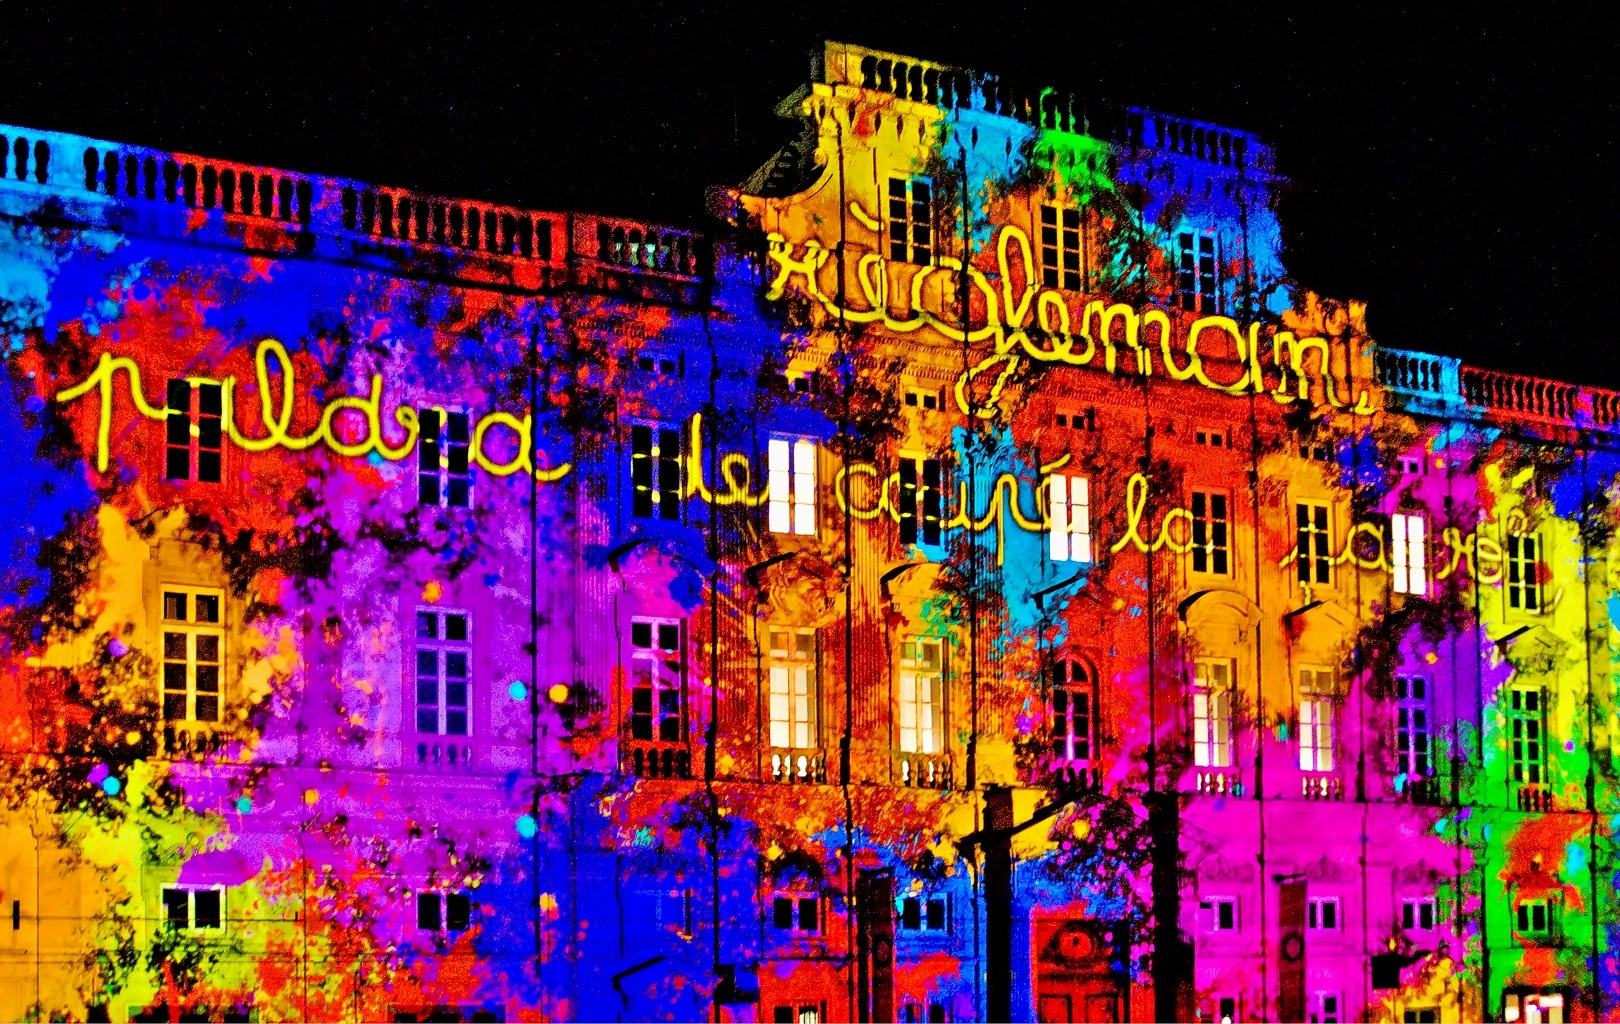 Lyon Festival Of Light - dramatic lighting